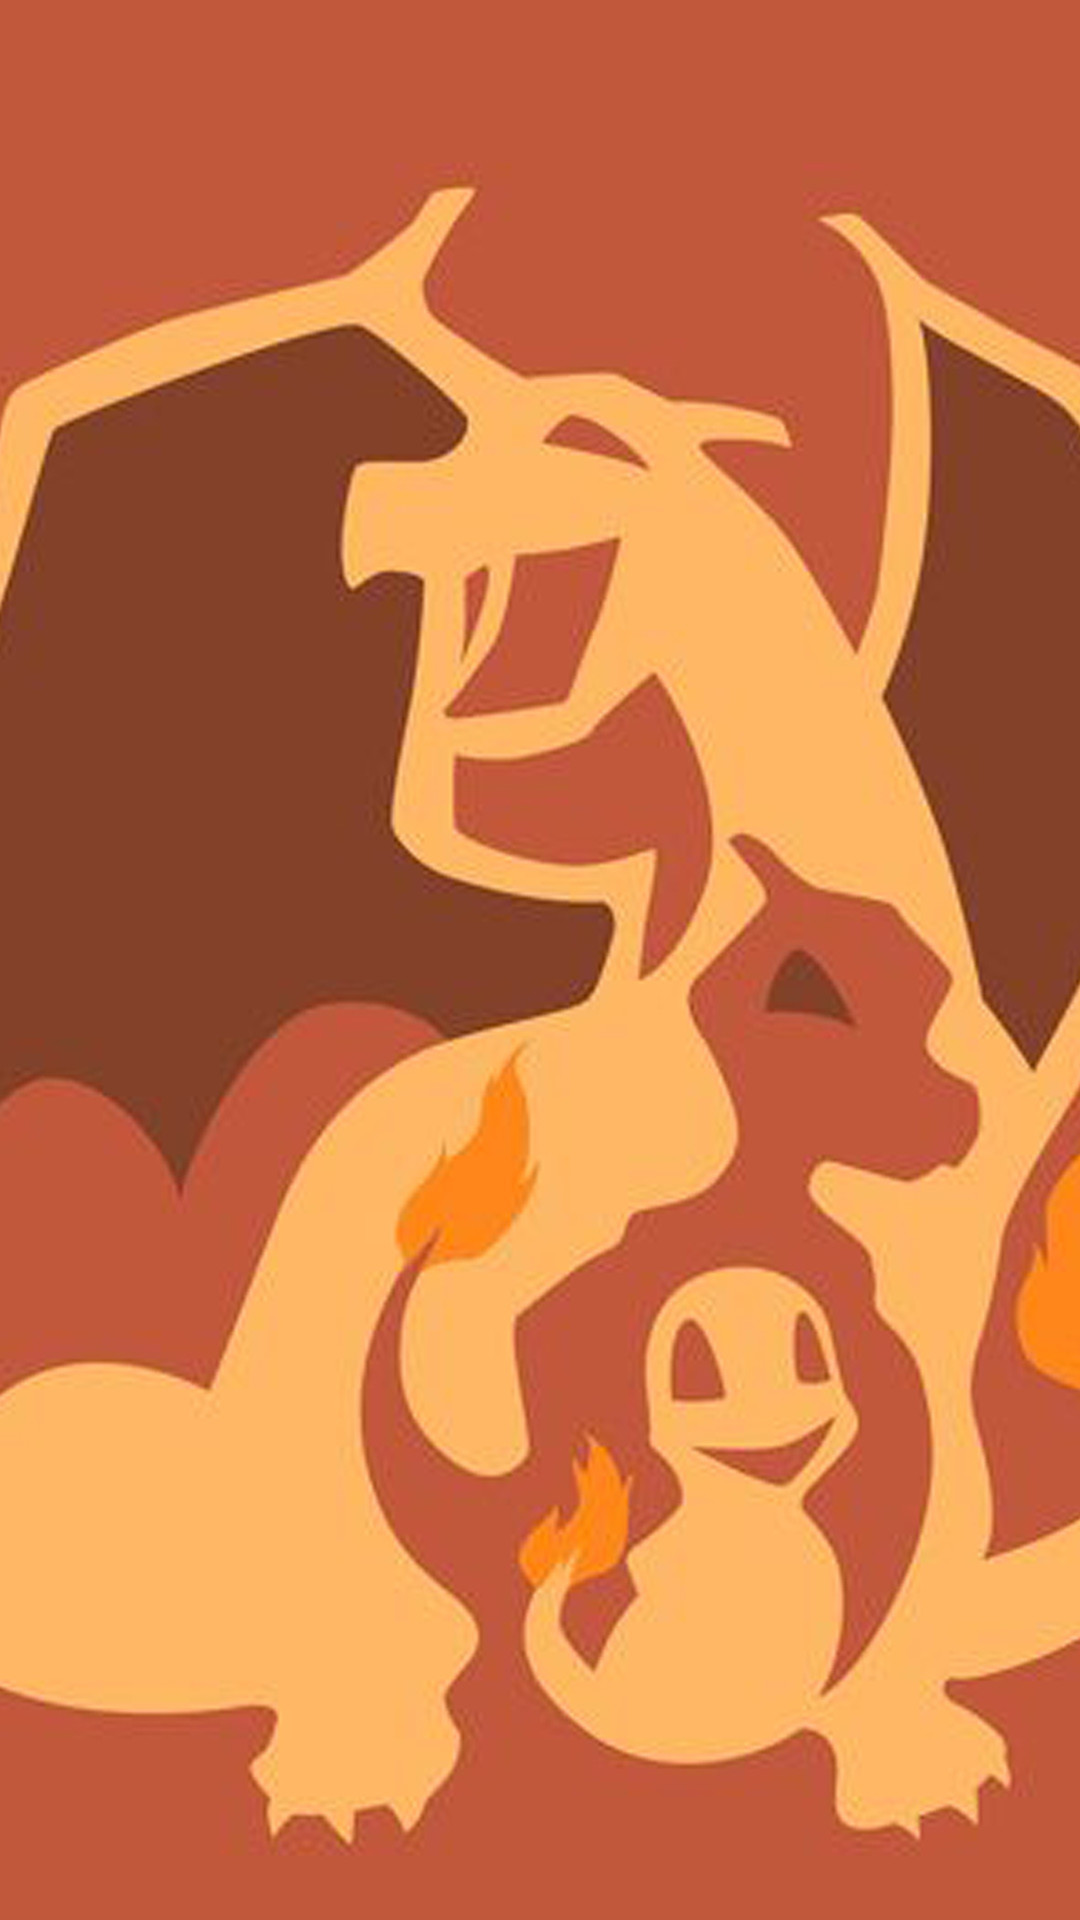 Res: 1080x1920, Charizard | Pokemon iPhoneX wallpapers